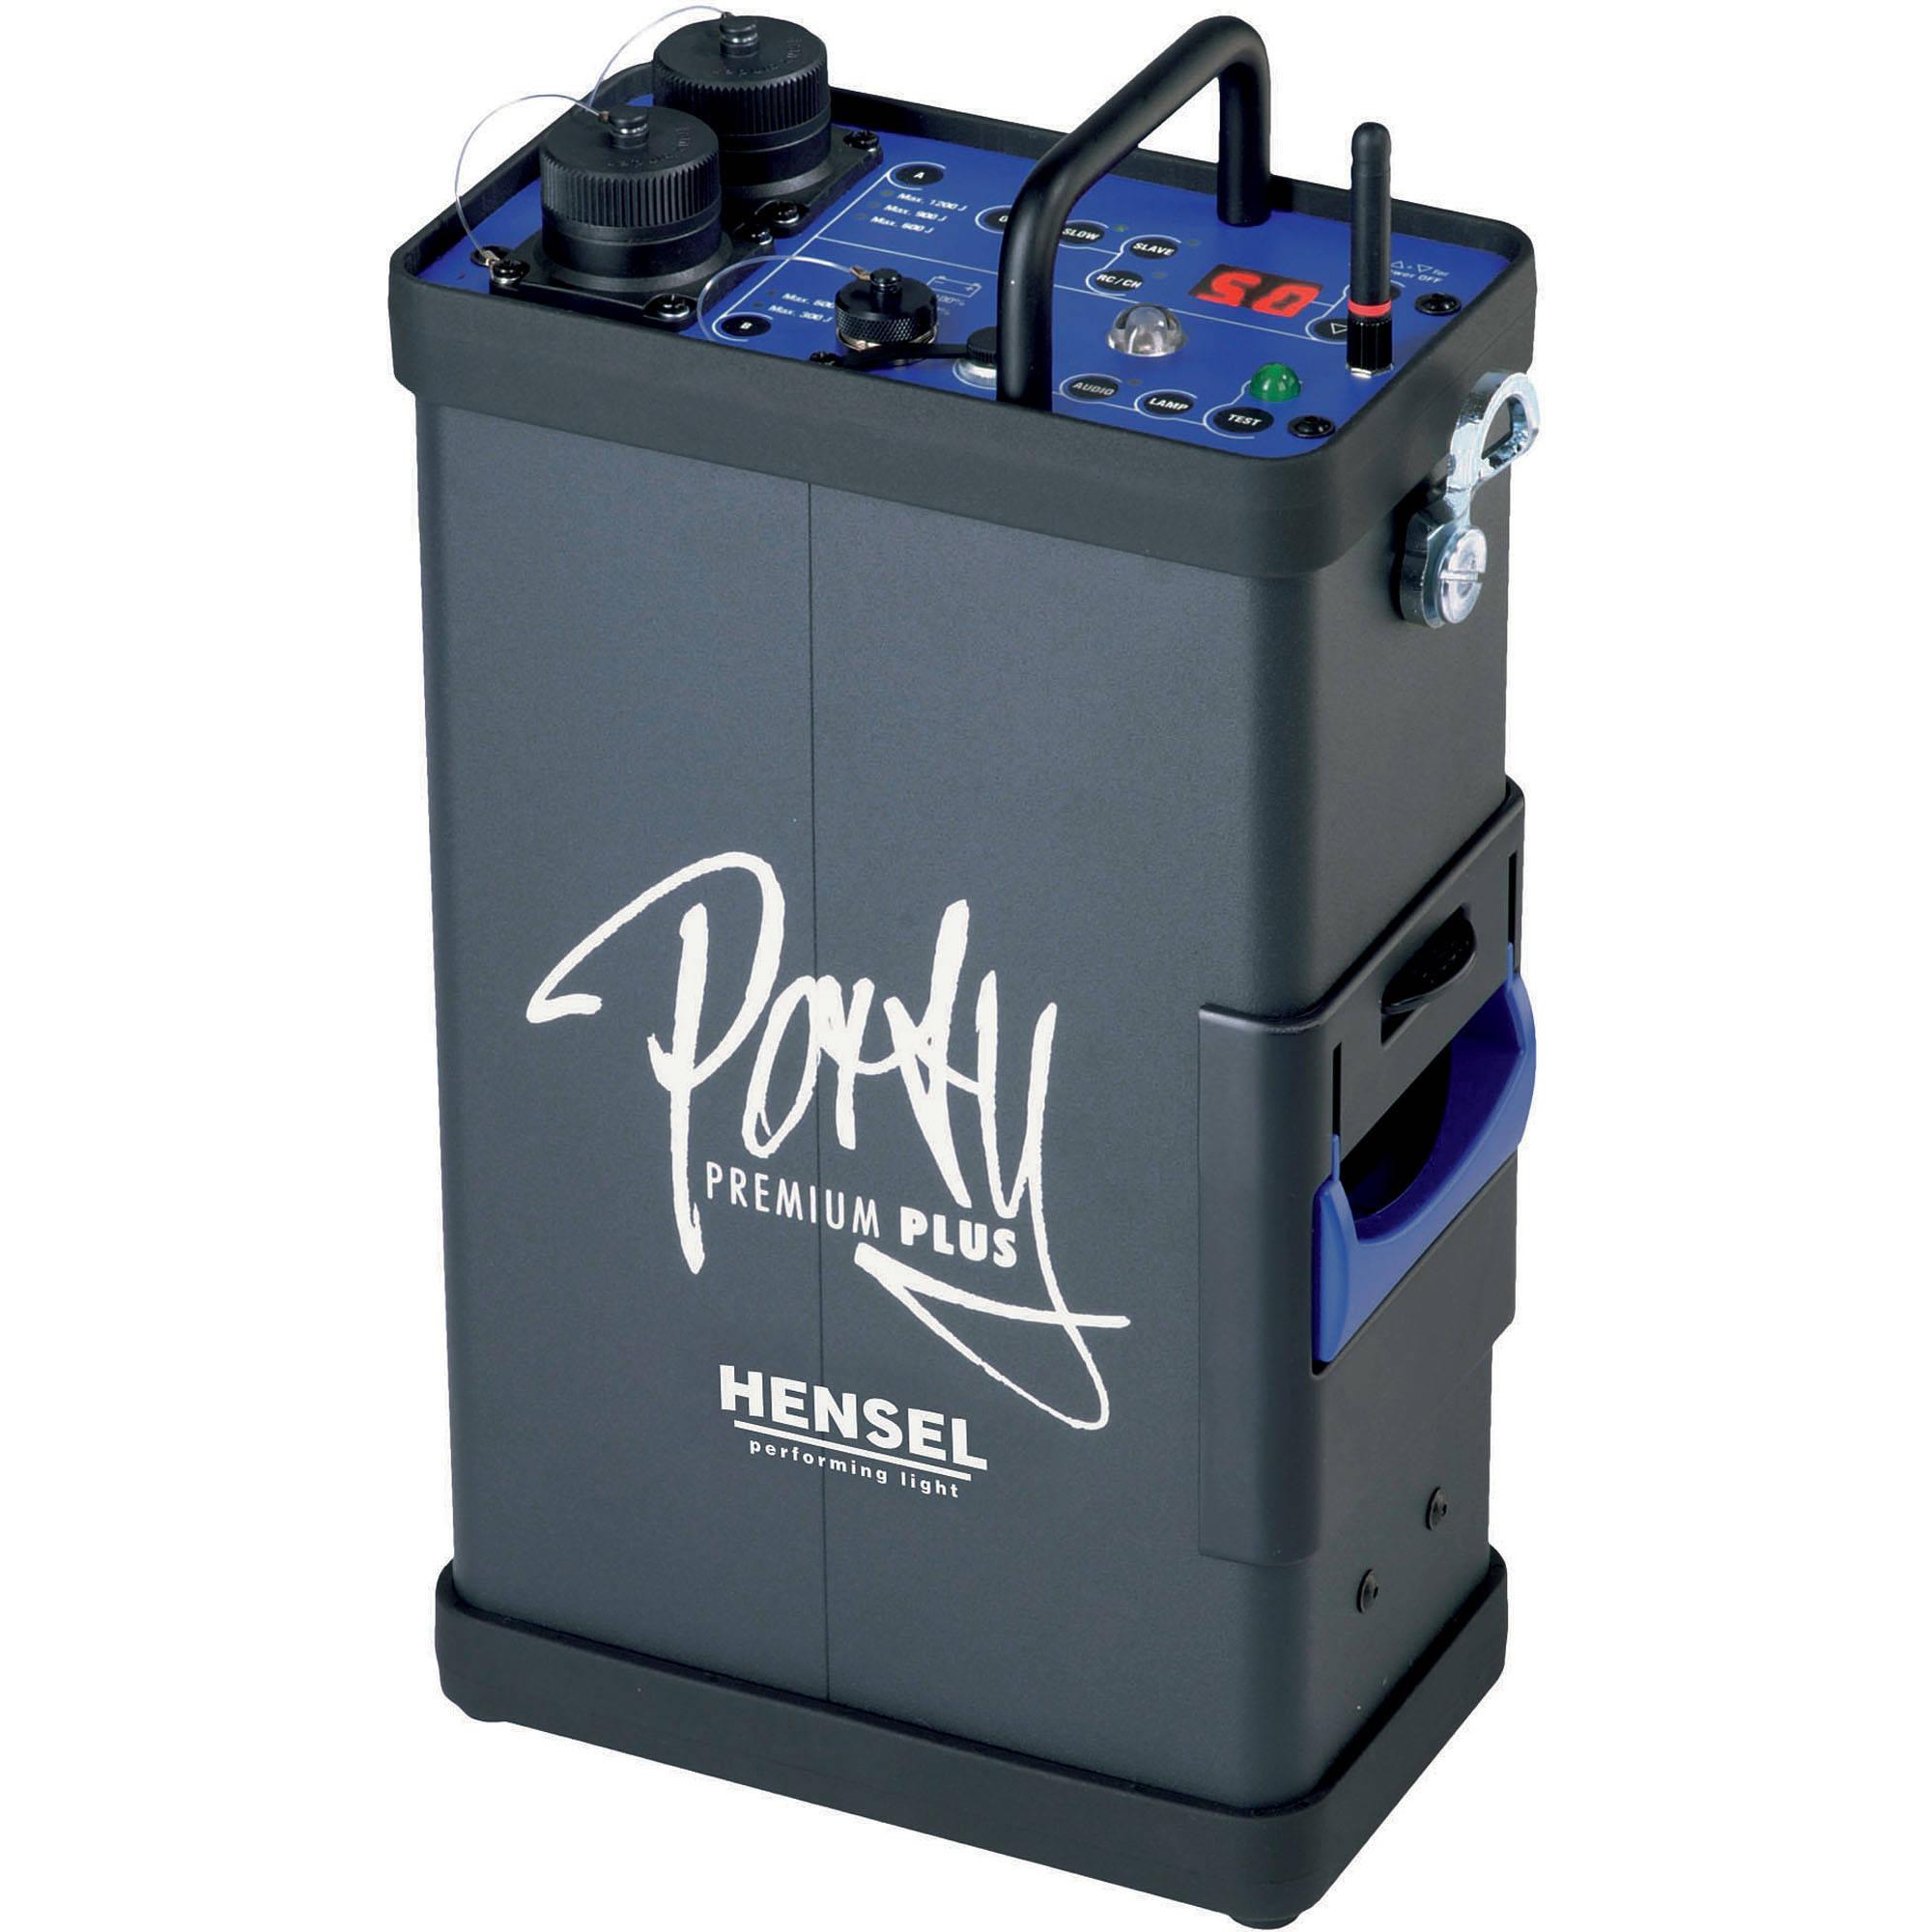 hensel 1200 w s premium plus battery power pack radio slave. Black Bedroom Furniture Sets. Home Design Ideas